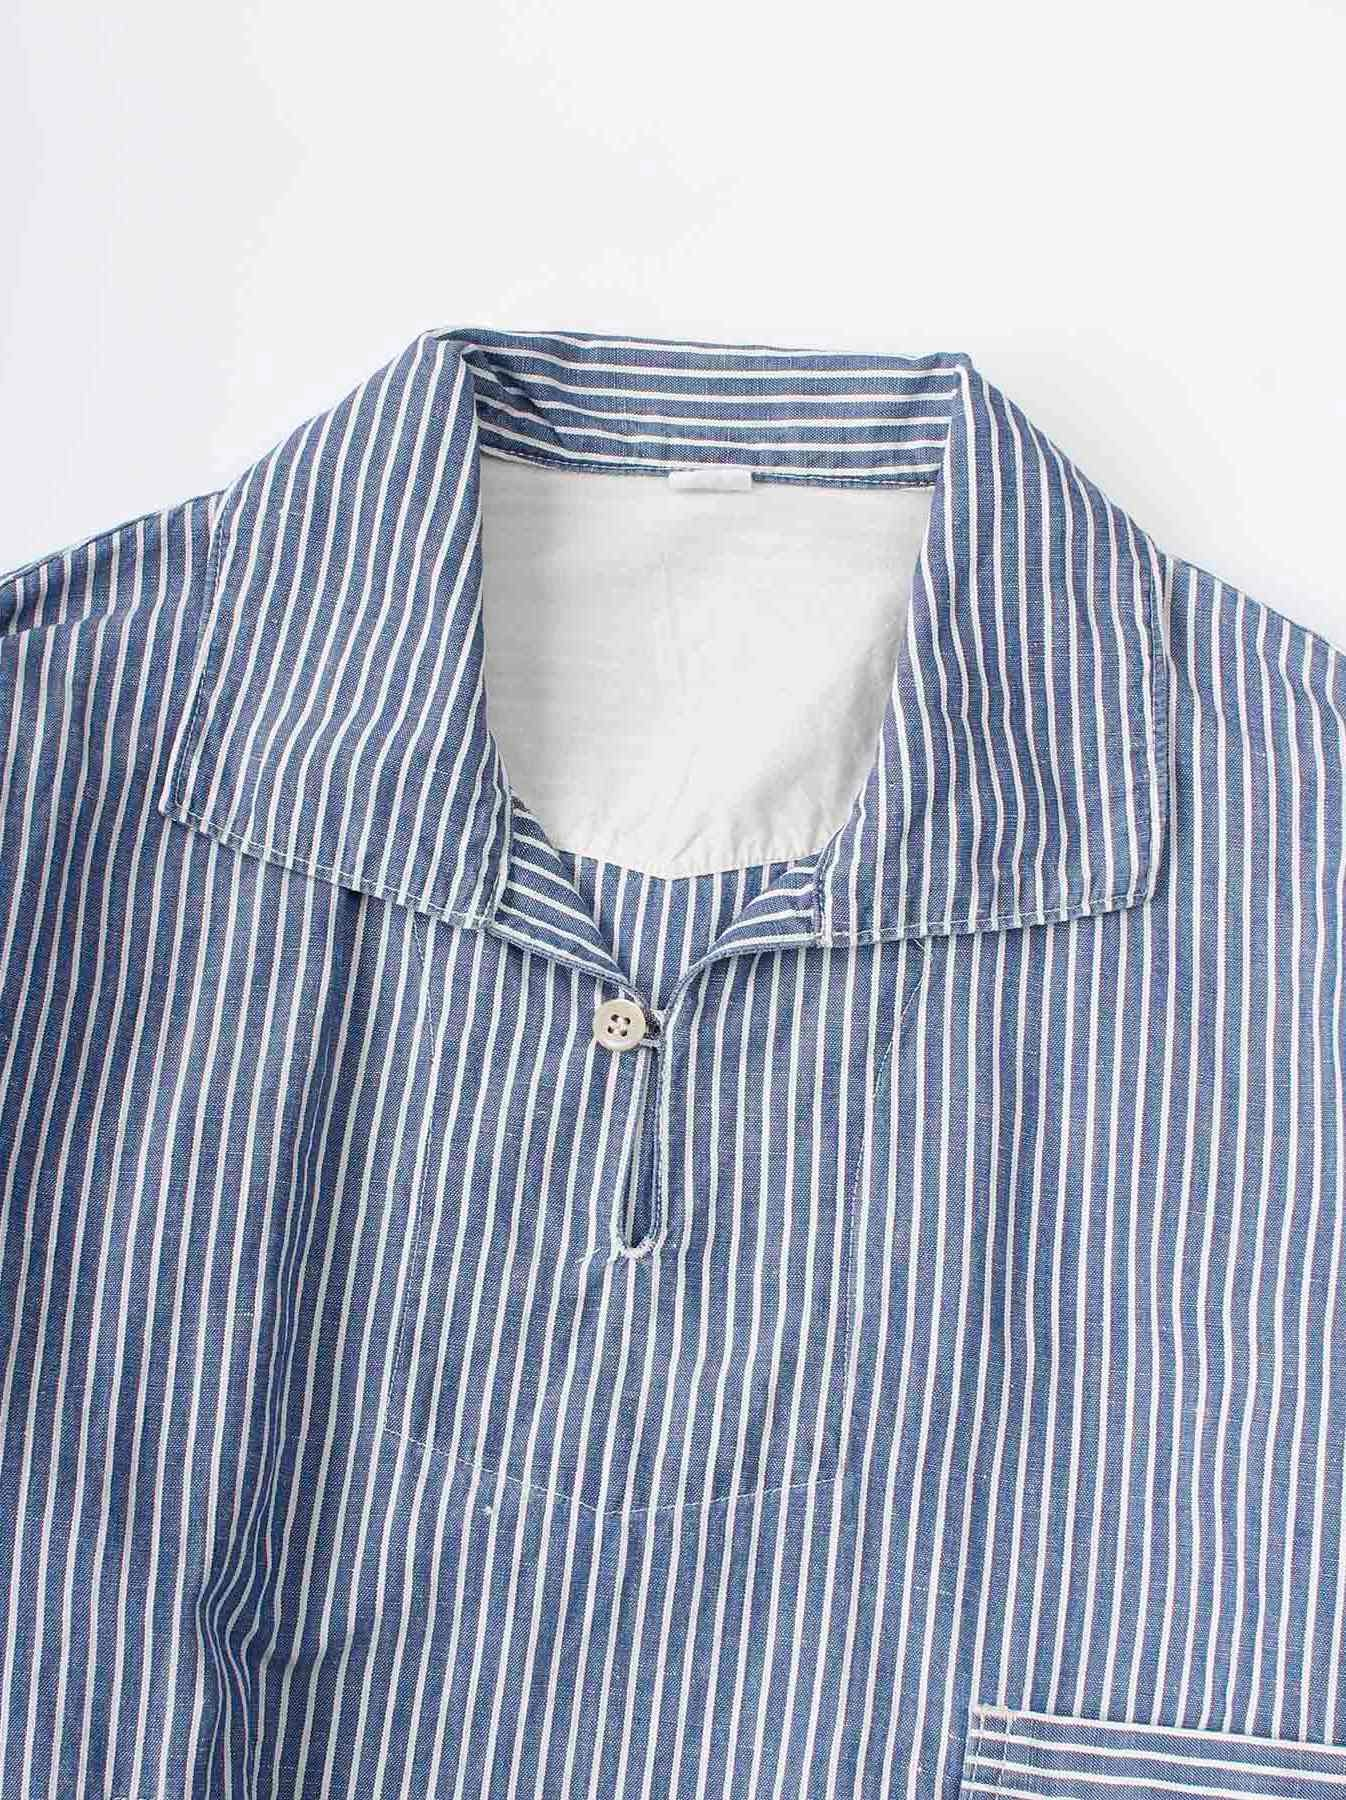 WH Cotton Linen Hickory Umahiko Pullover Shirt-6